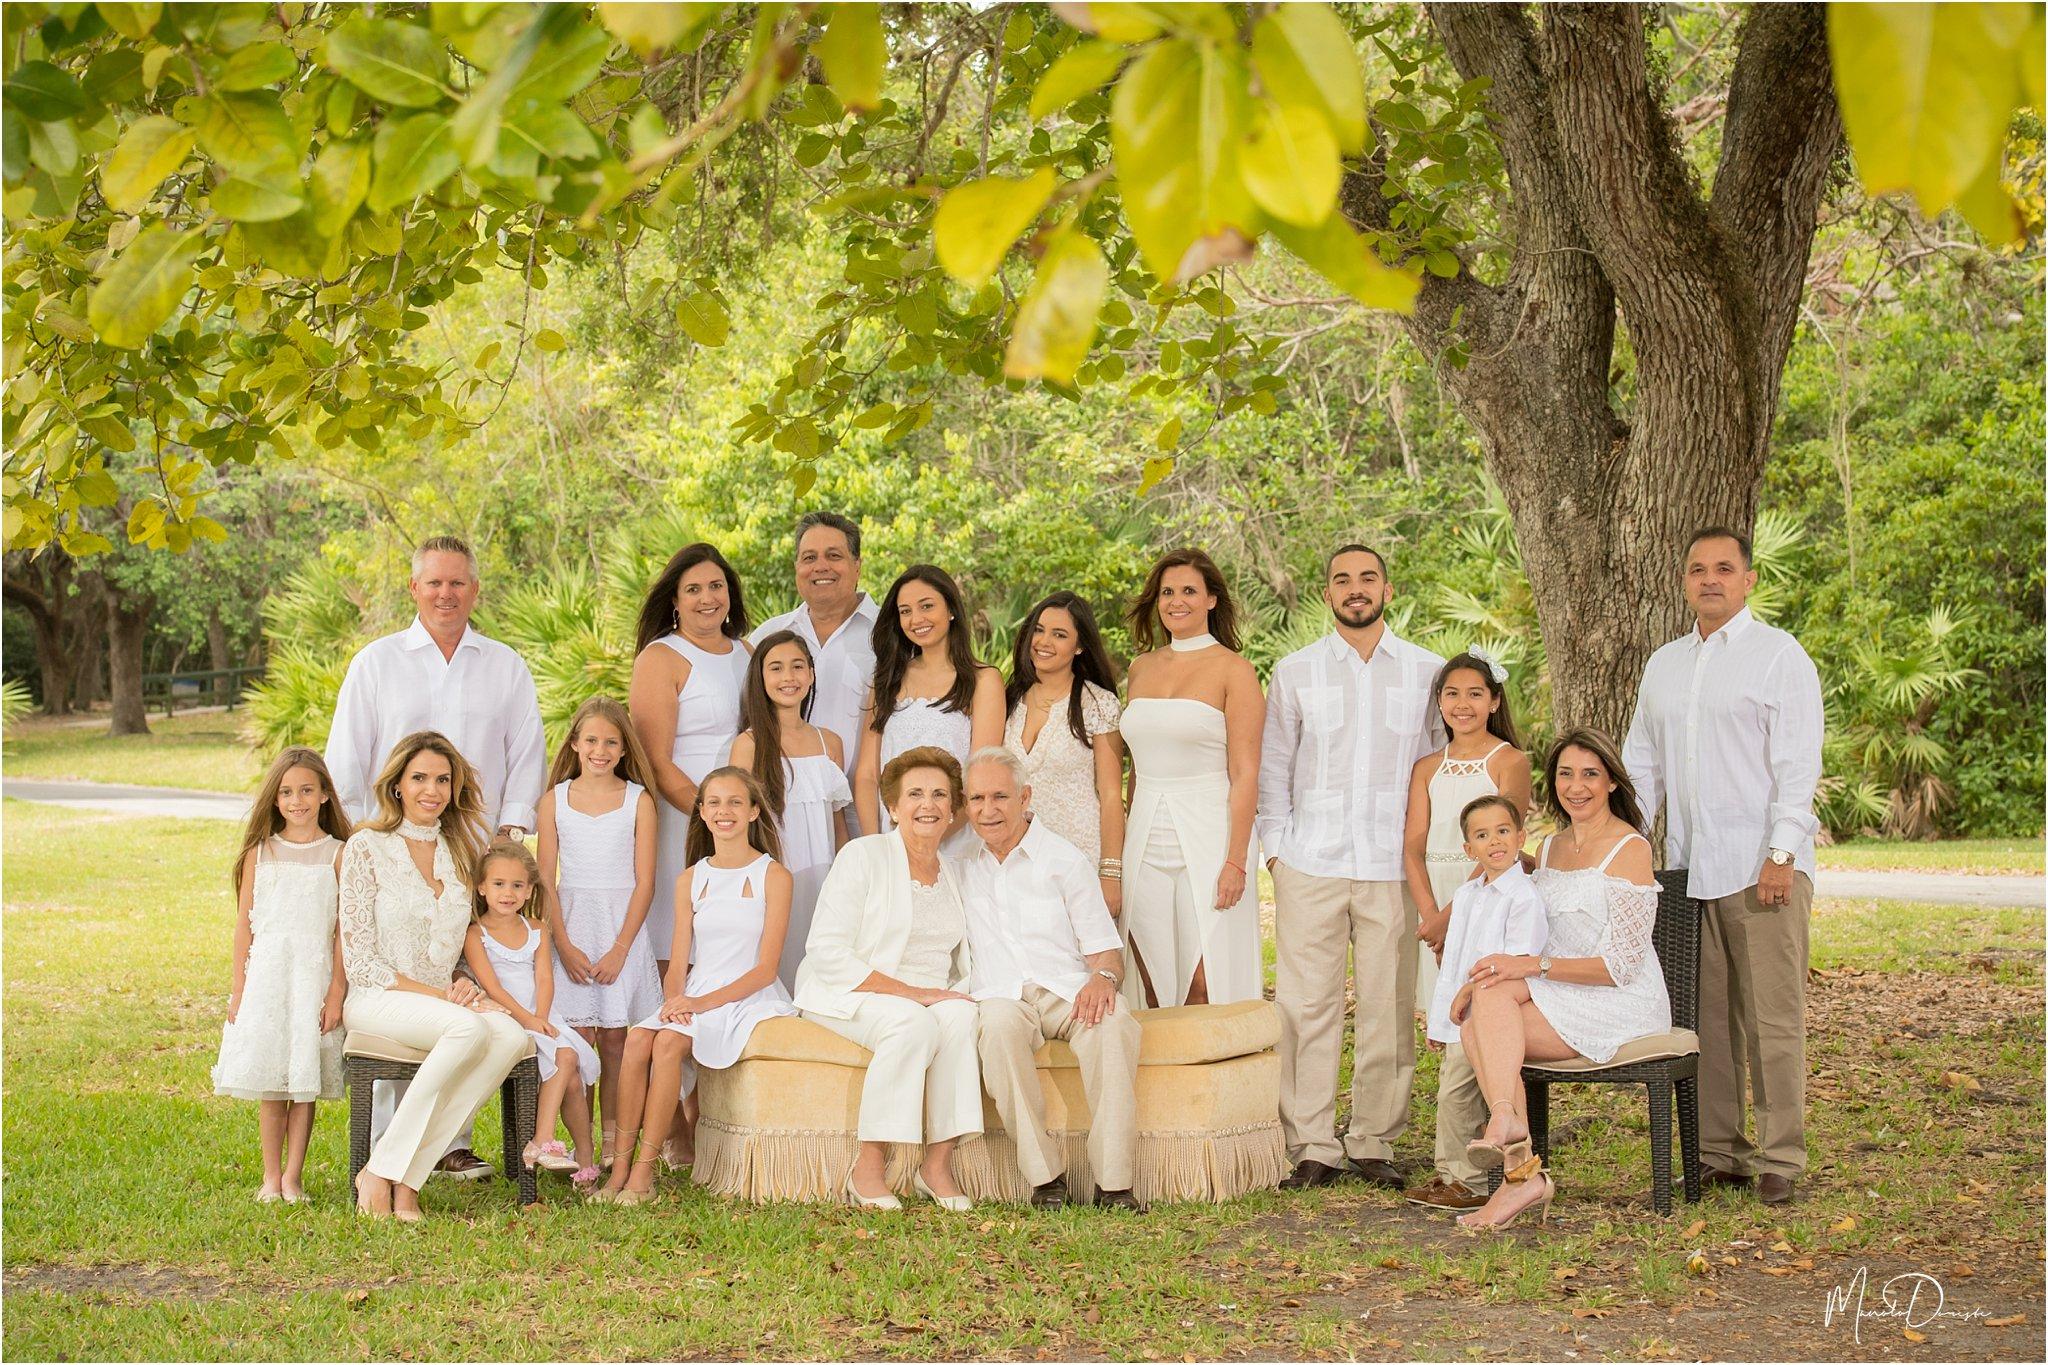 0554_ManoloDoreste_InFocusStudios_Wedding_Family_Photography_Miami_MiamiPhotographer.jpg